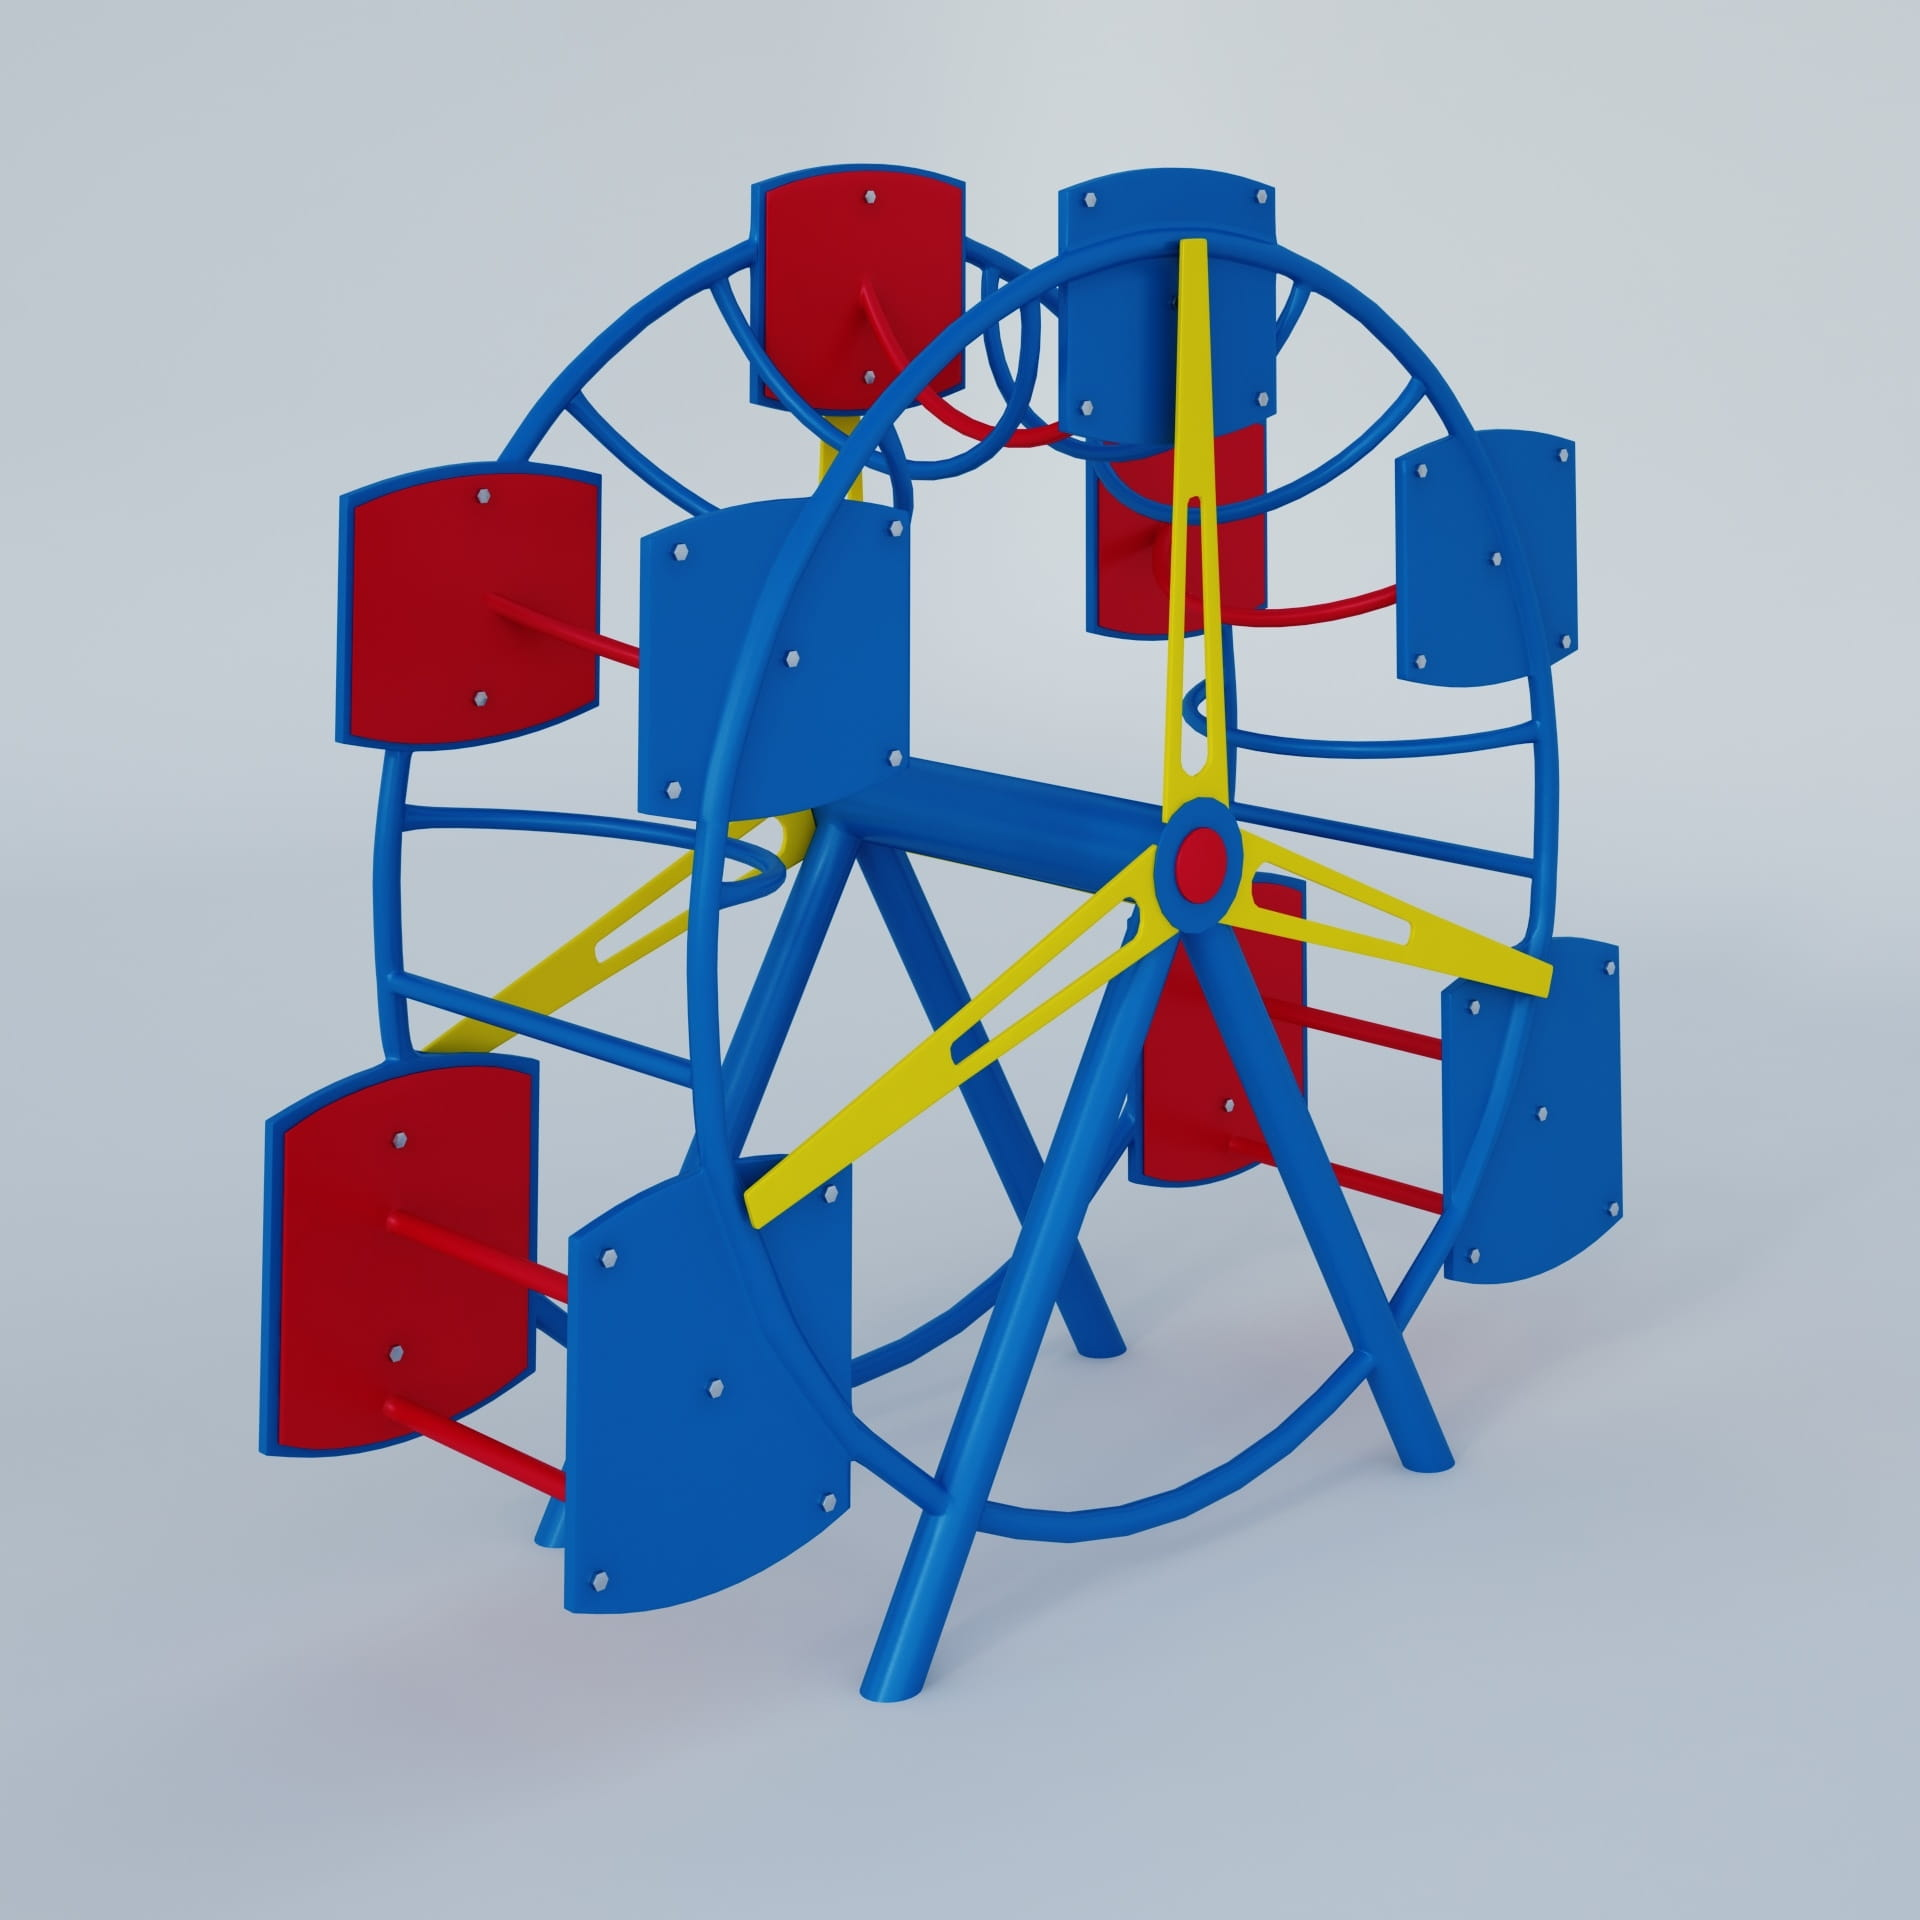 playground equipment 24 AM244 Archmodels